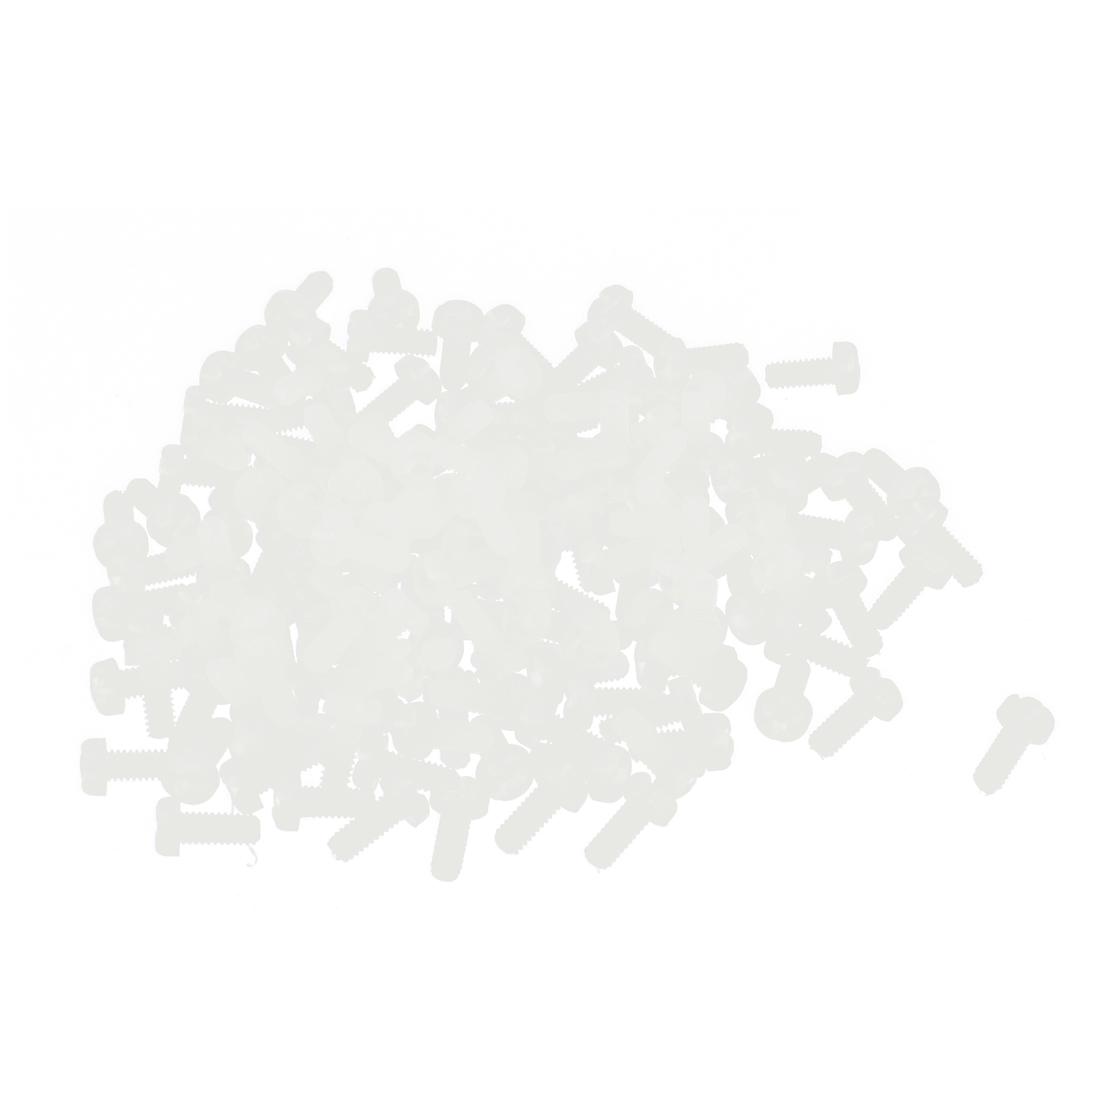 M2 x 5mm Nylon 6/6 Fillister Head Phillips Drive Machine Screw Off White 100pcs